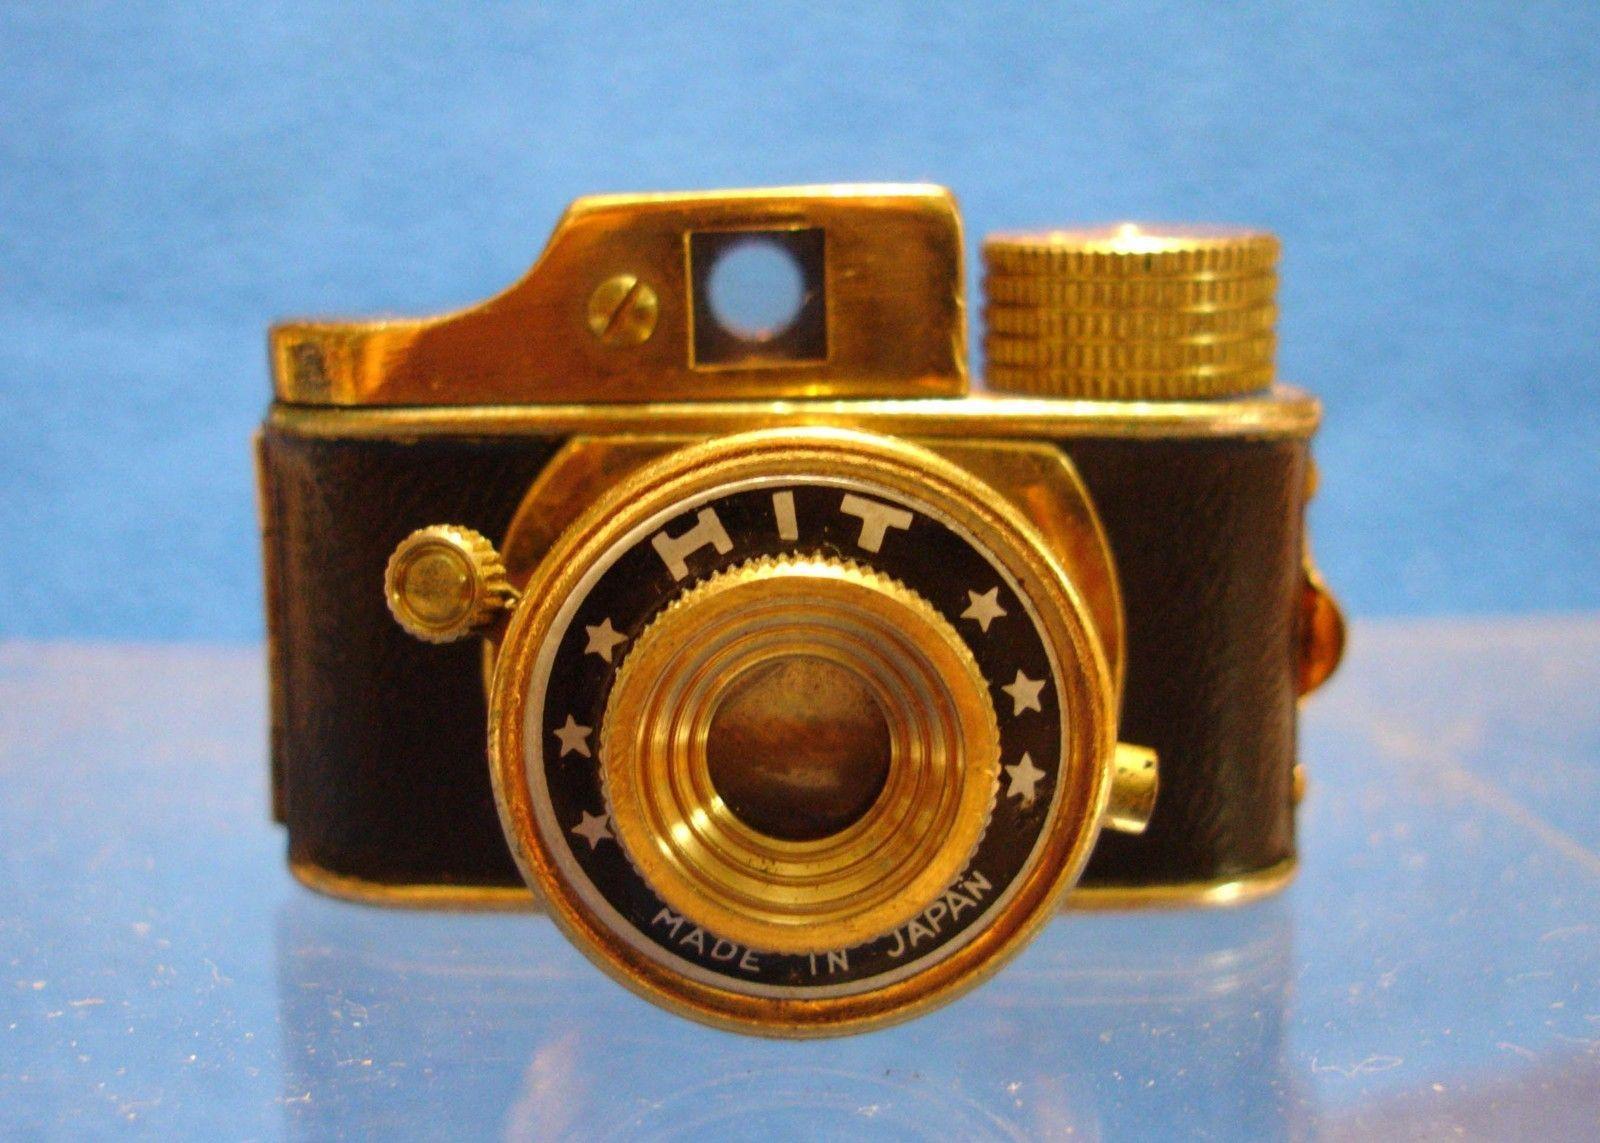 Amateur Spy Cam Porn hit subminiature 16mm camera gold vintage 1950's japanese